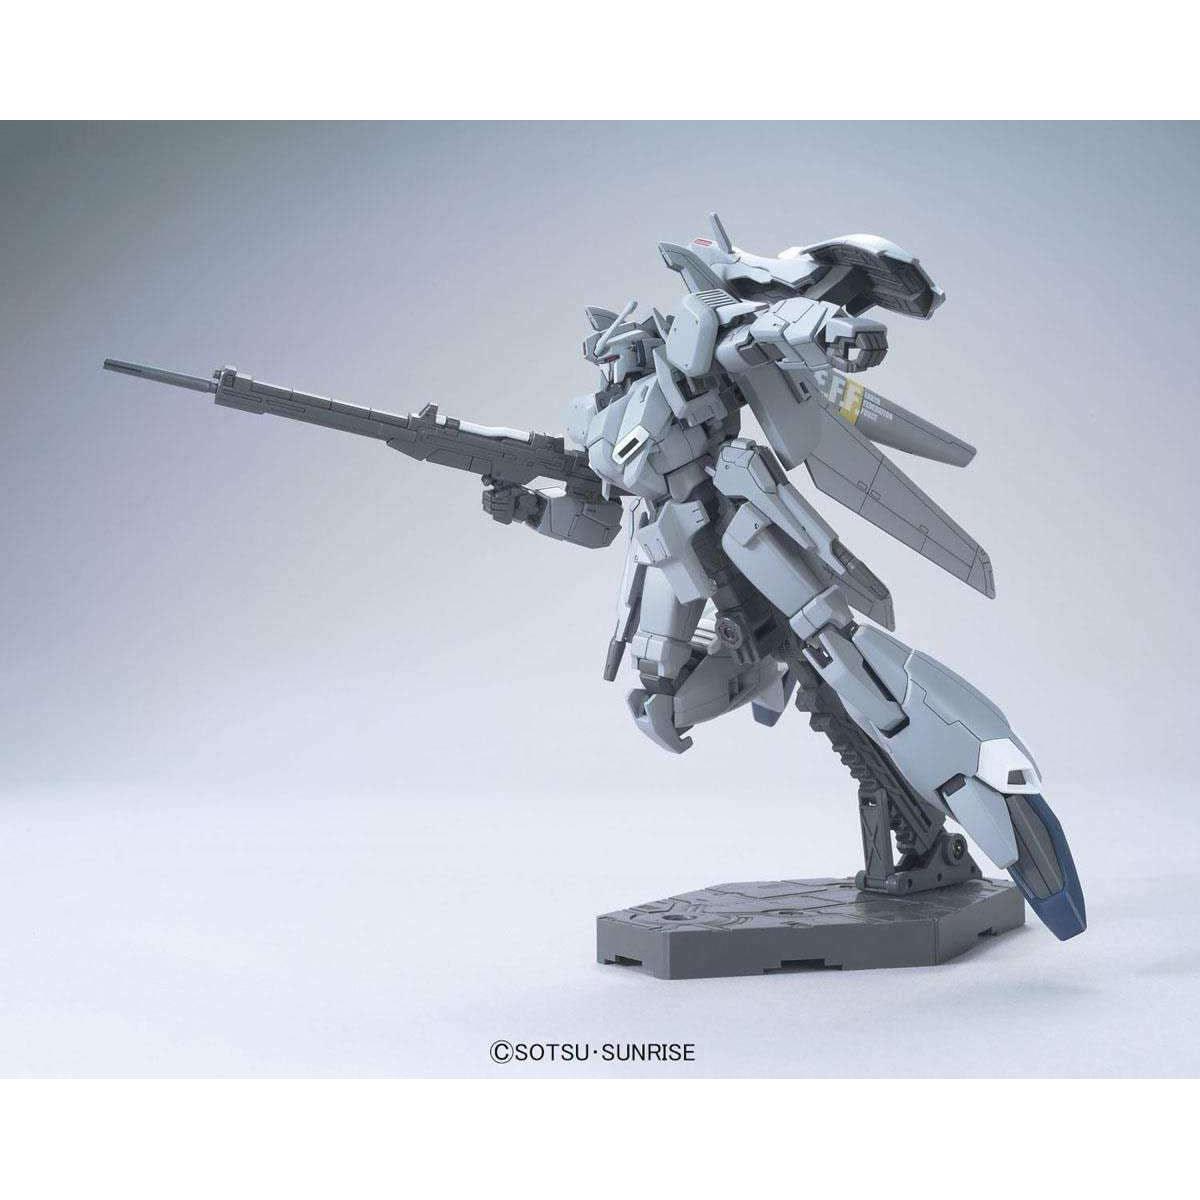 Image of HGUC MSZ-006A1 Zeta Plus A1 (Unicorn Ver.)